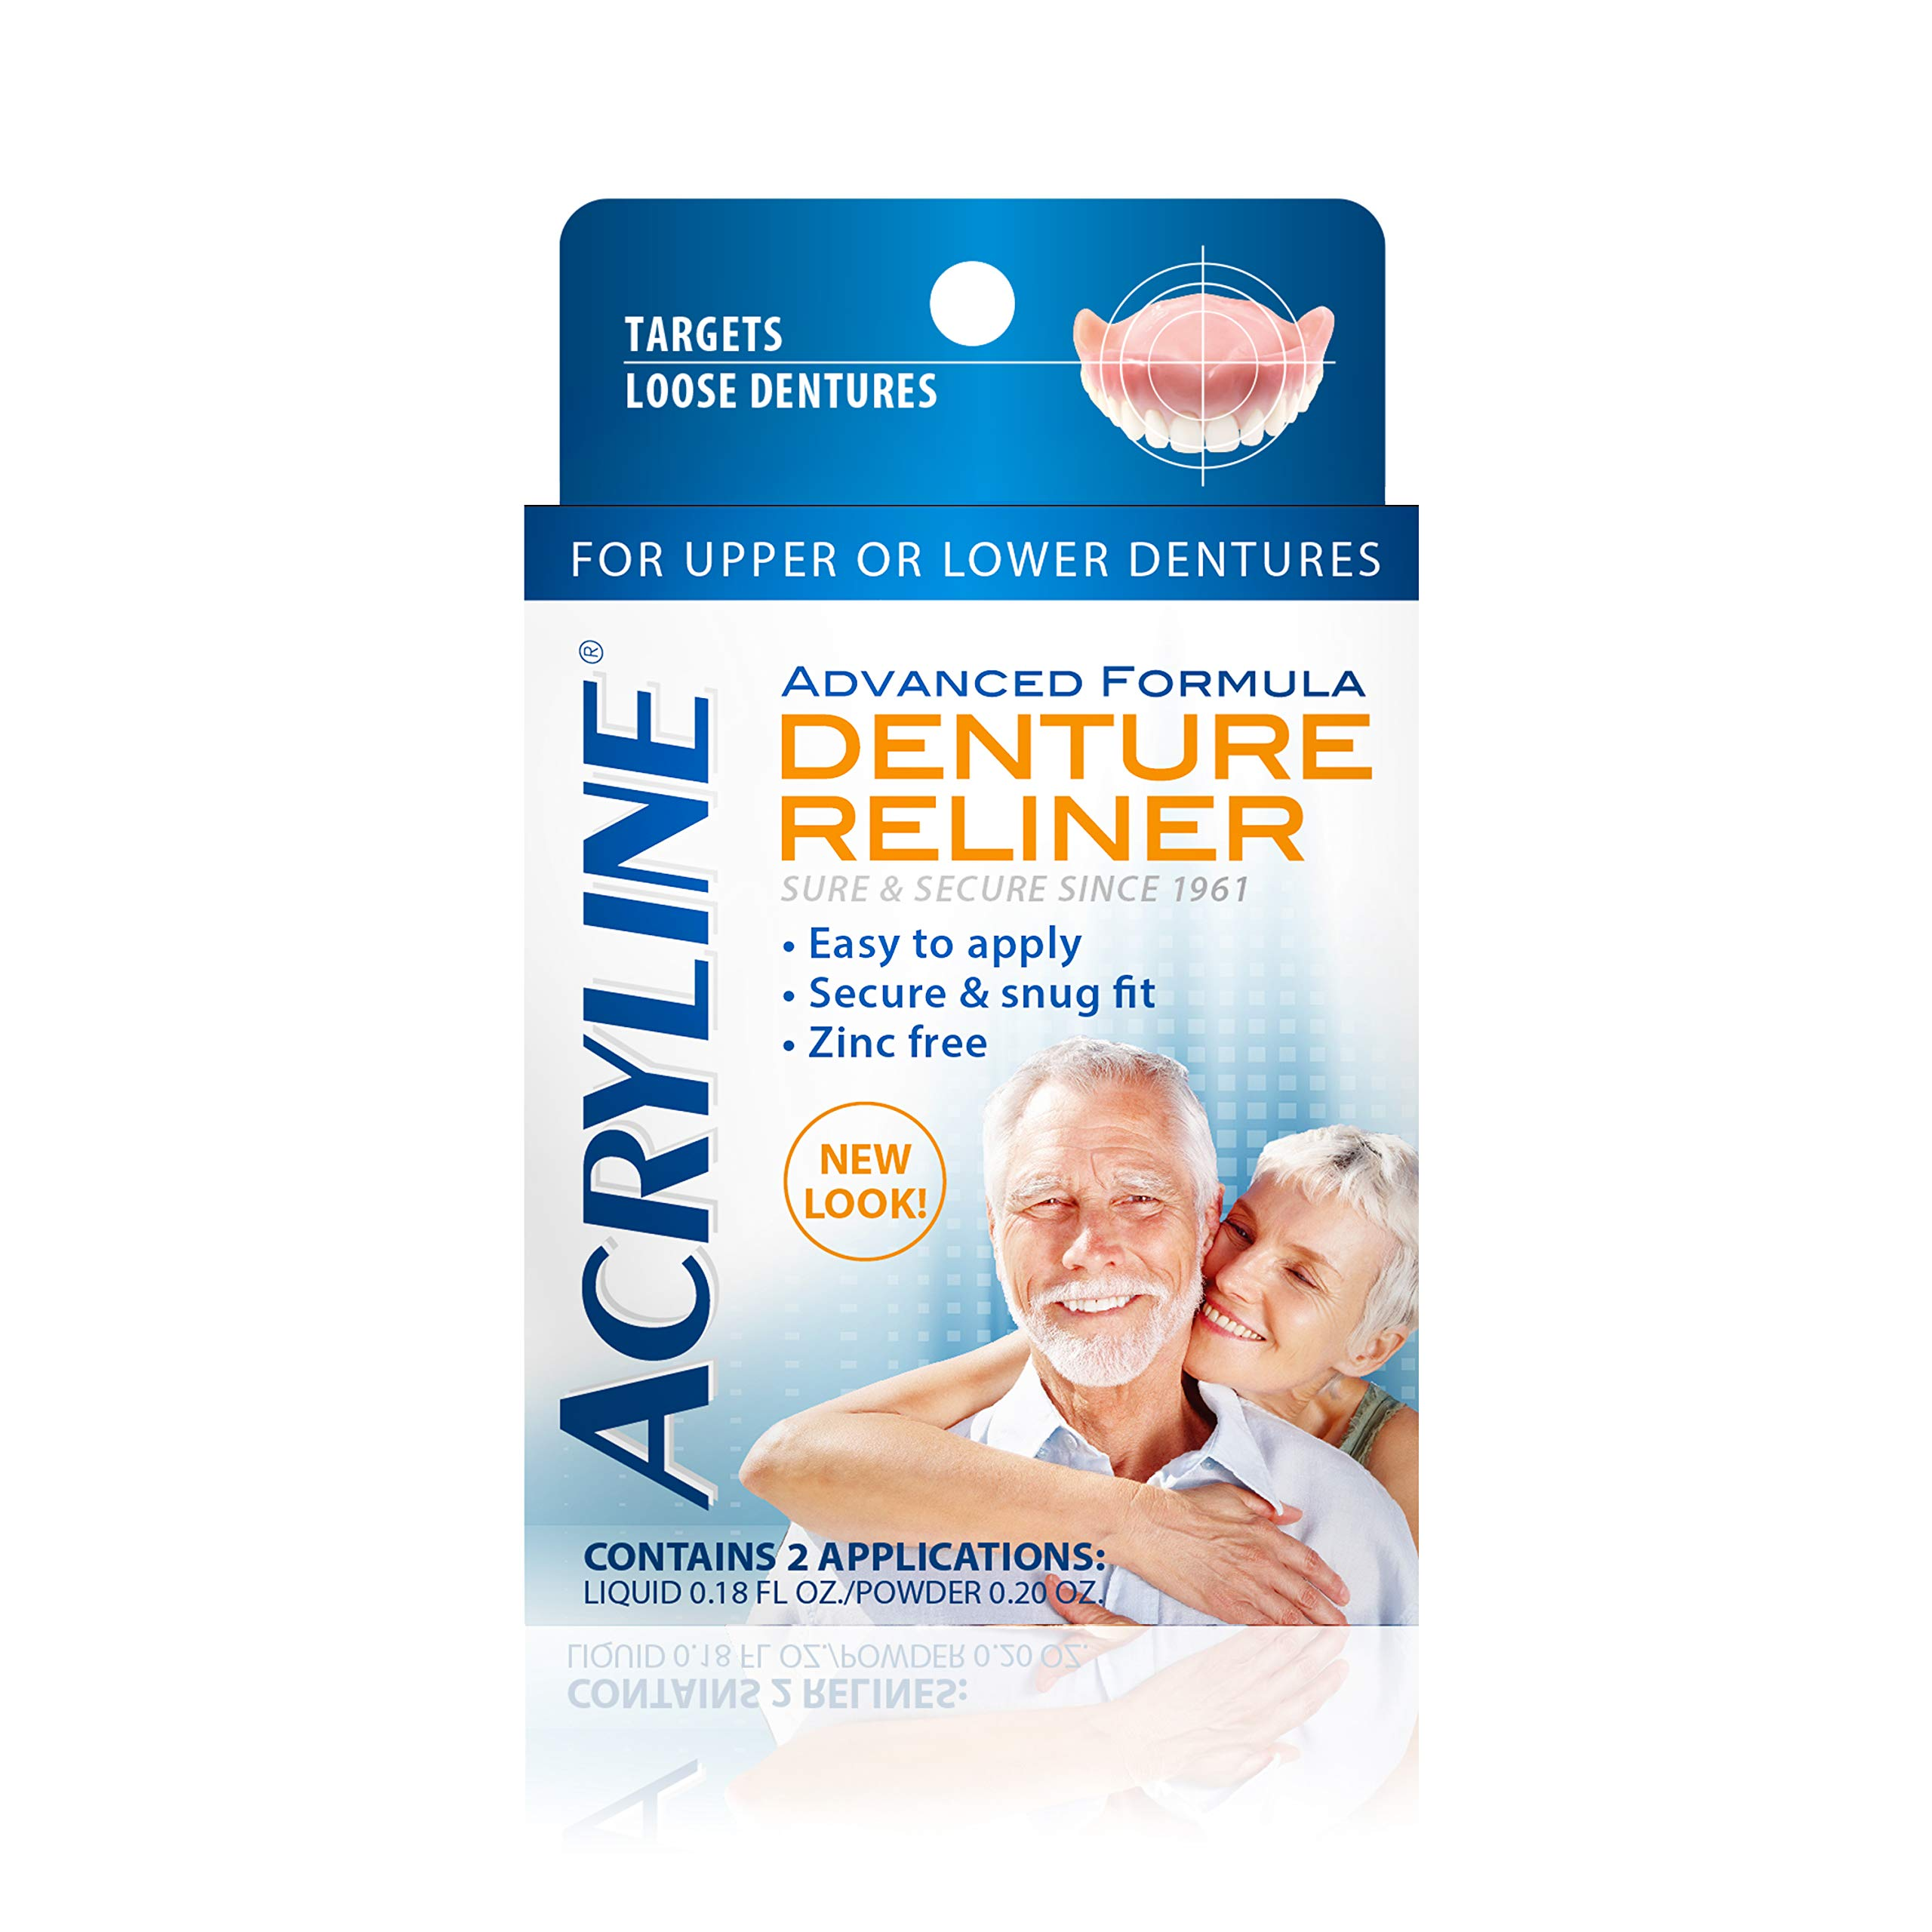 Acryline Advanced Formula Denture Reliner - Refit and Tighten Dentures/for Both Upper & Lower Dentures/Easy Application